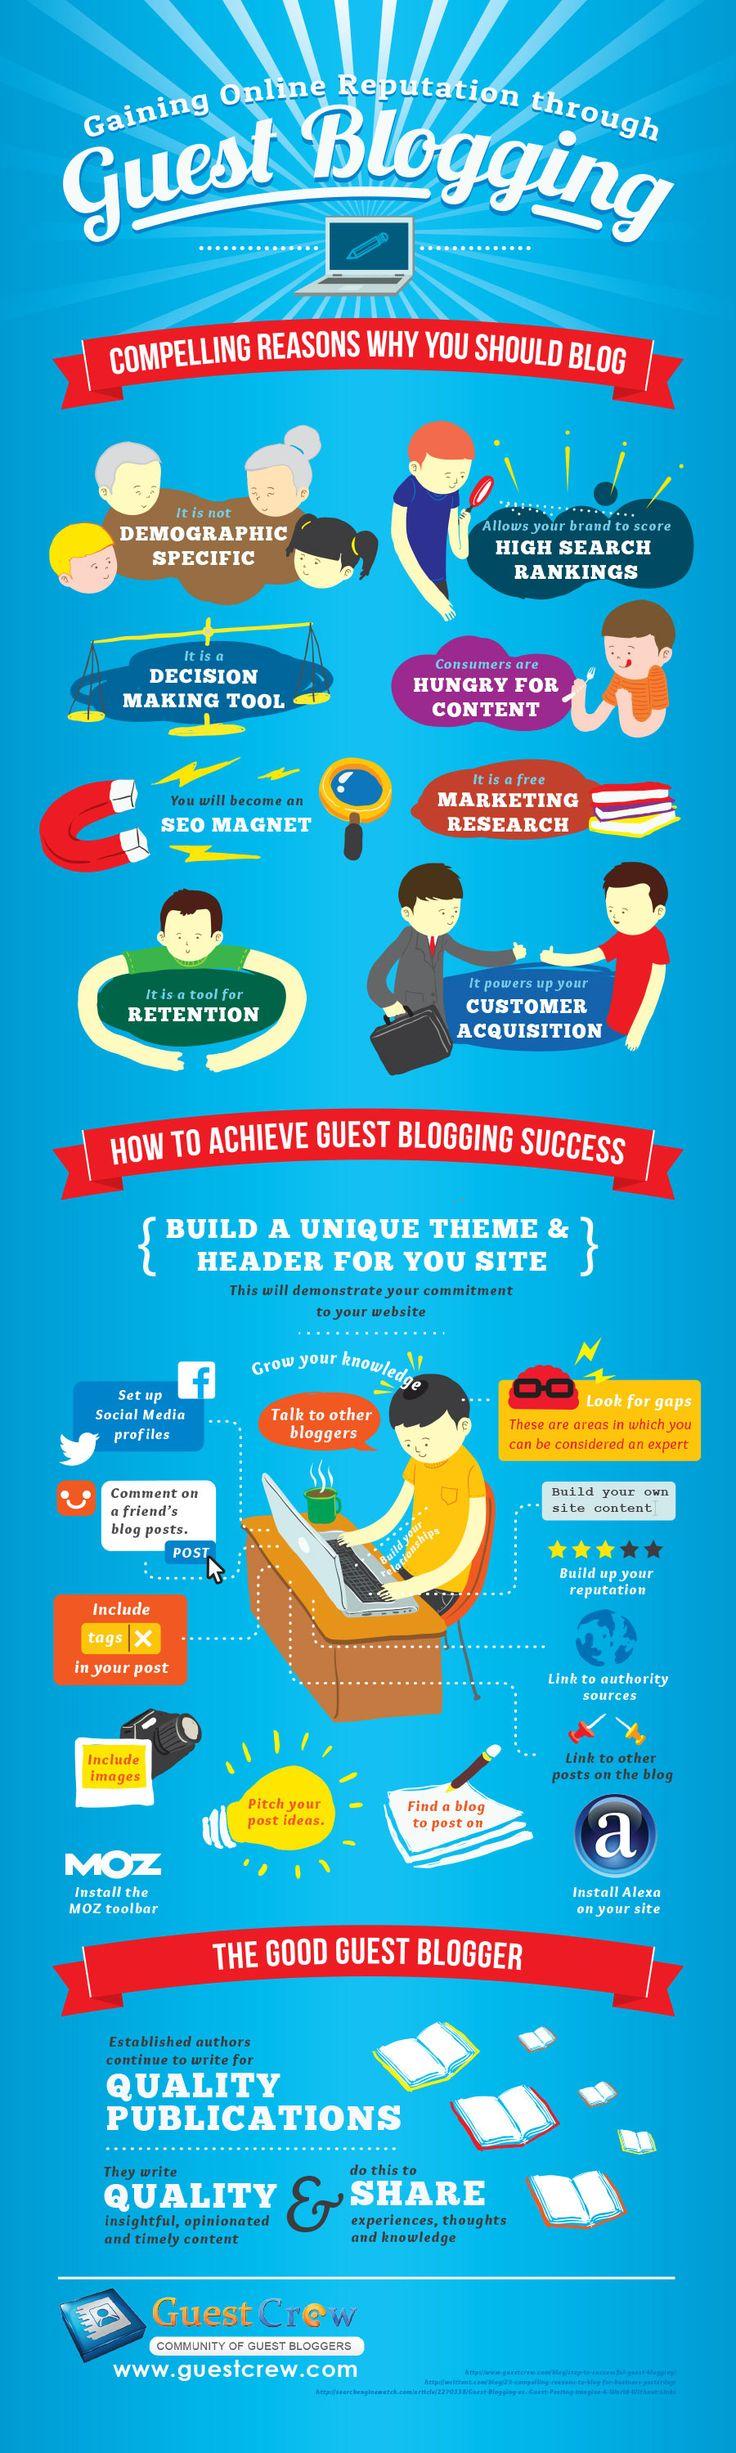 Gaining Online Reputation Through Guest Blogging #infographic